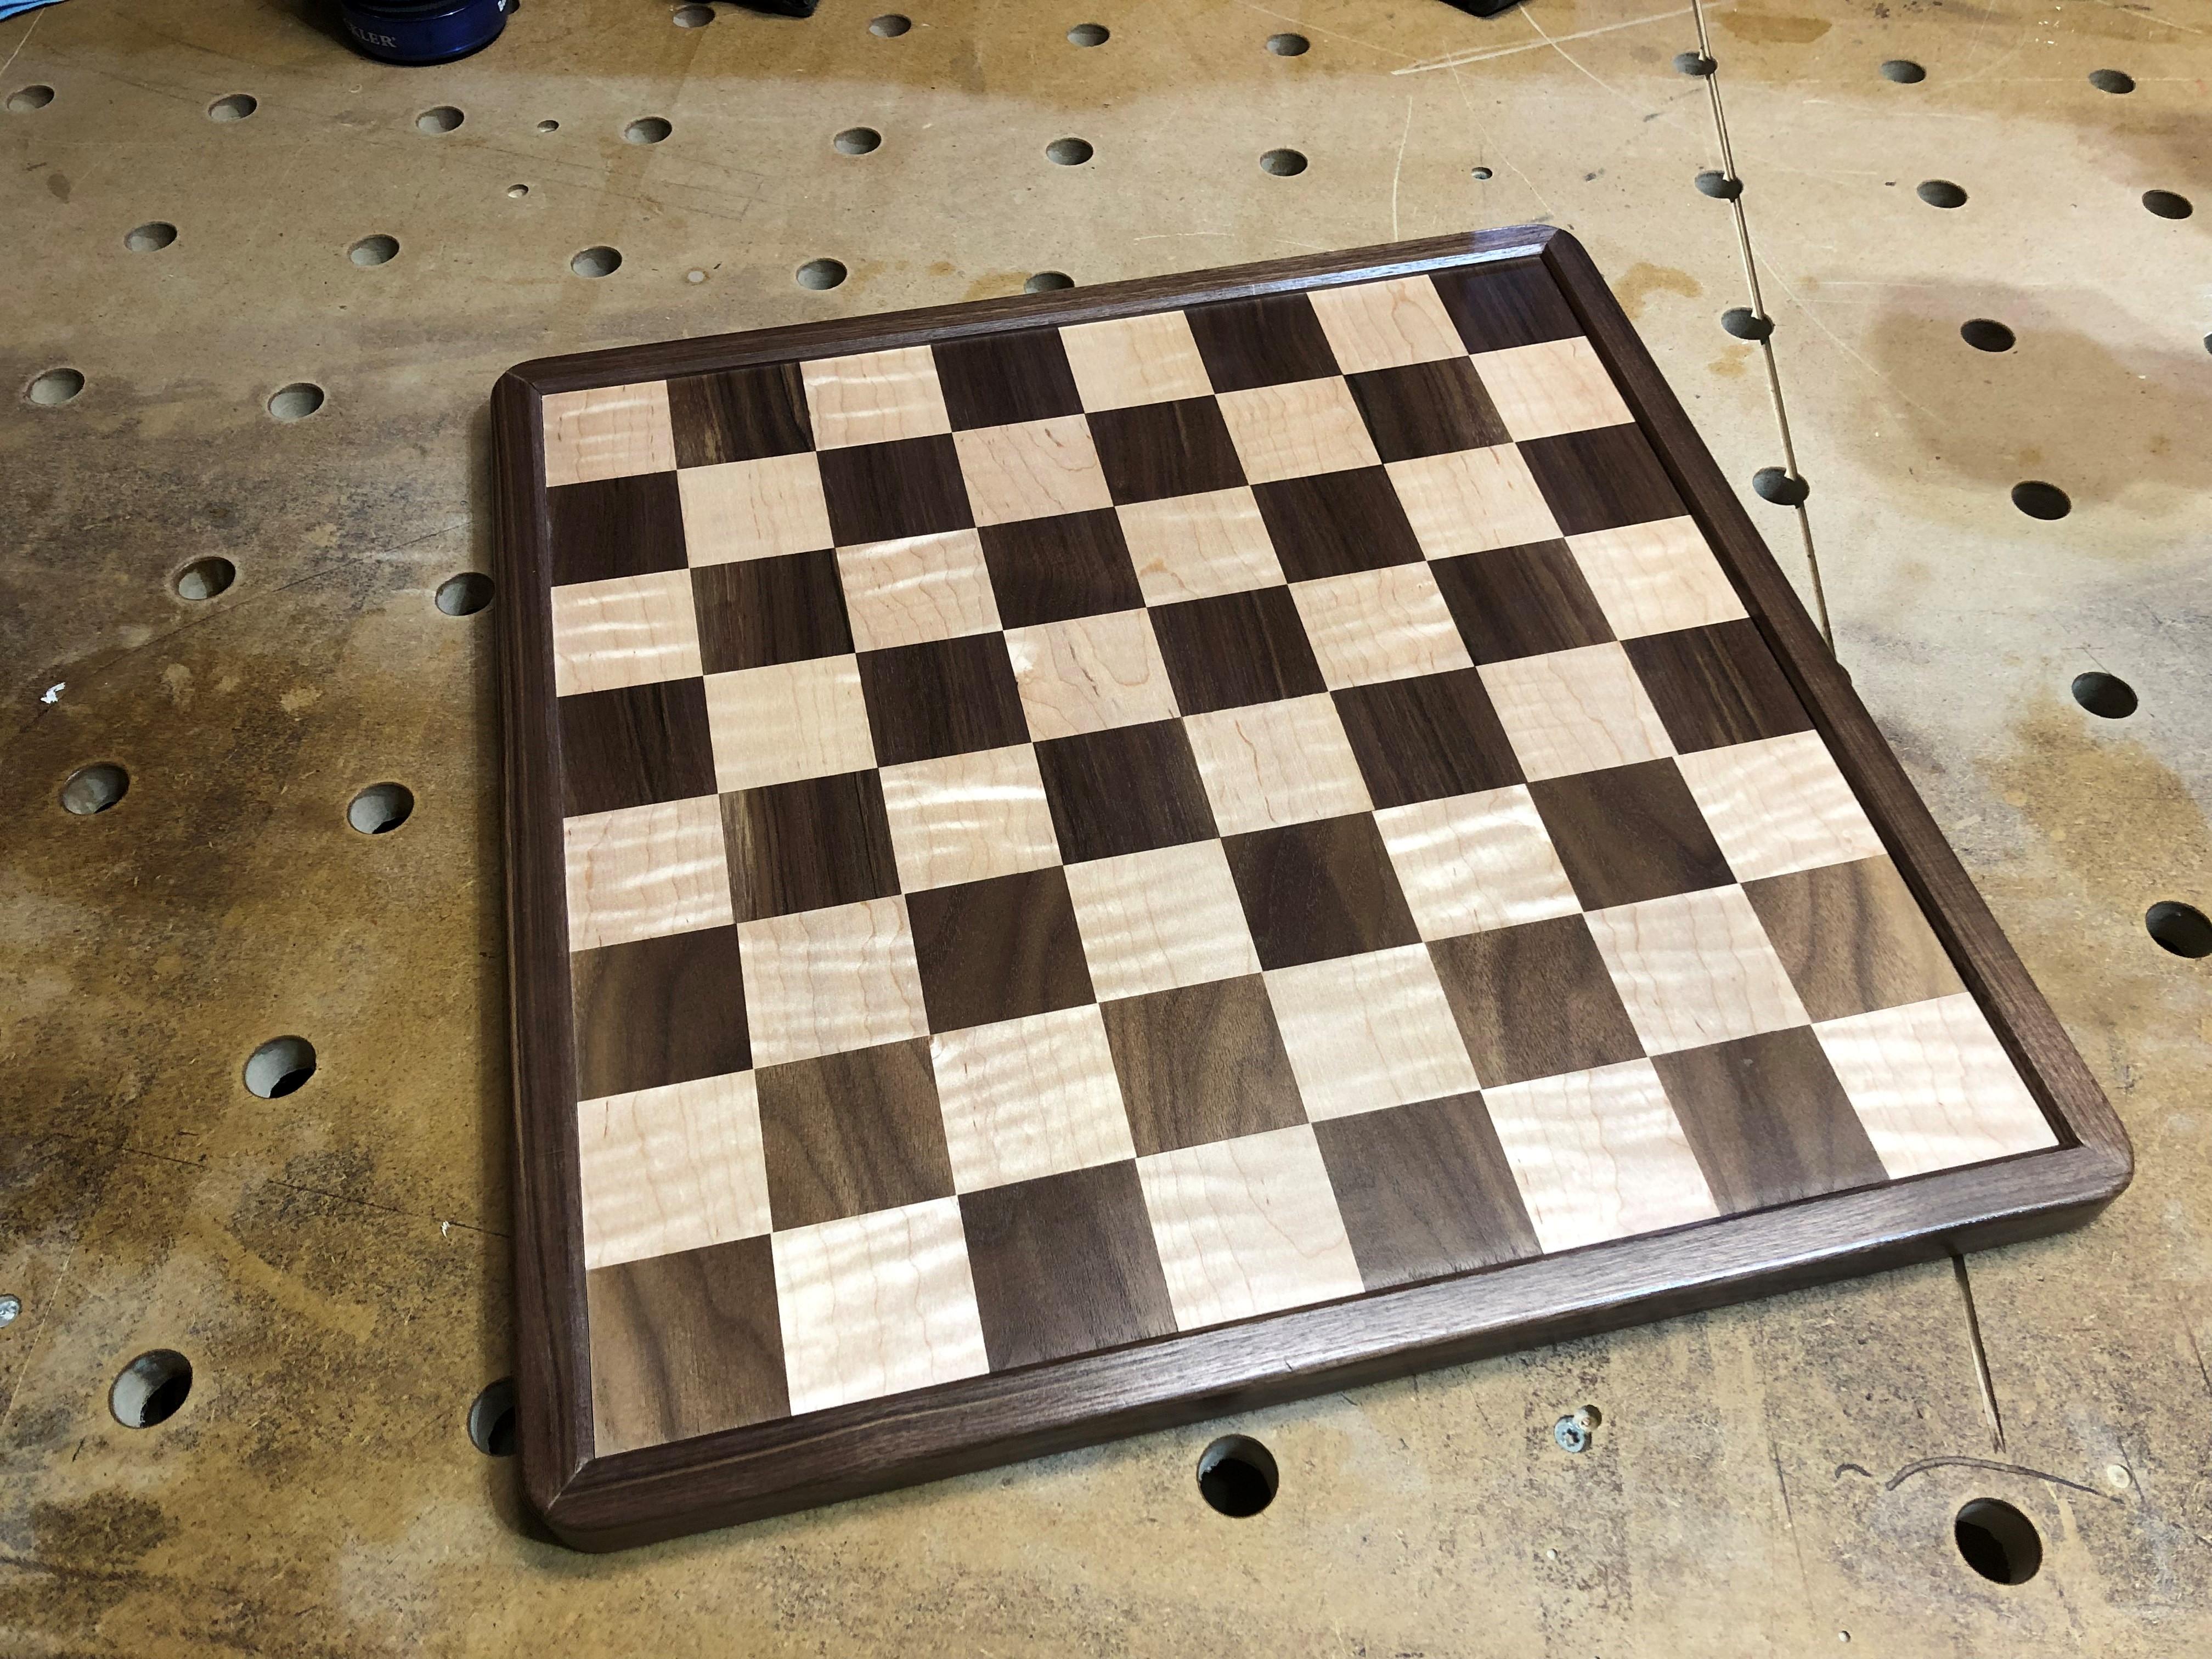 chess board 1.jpg